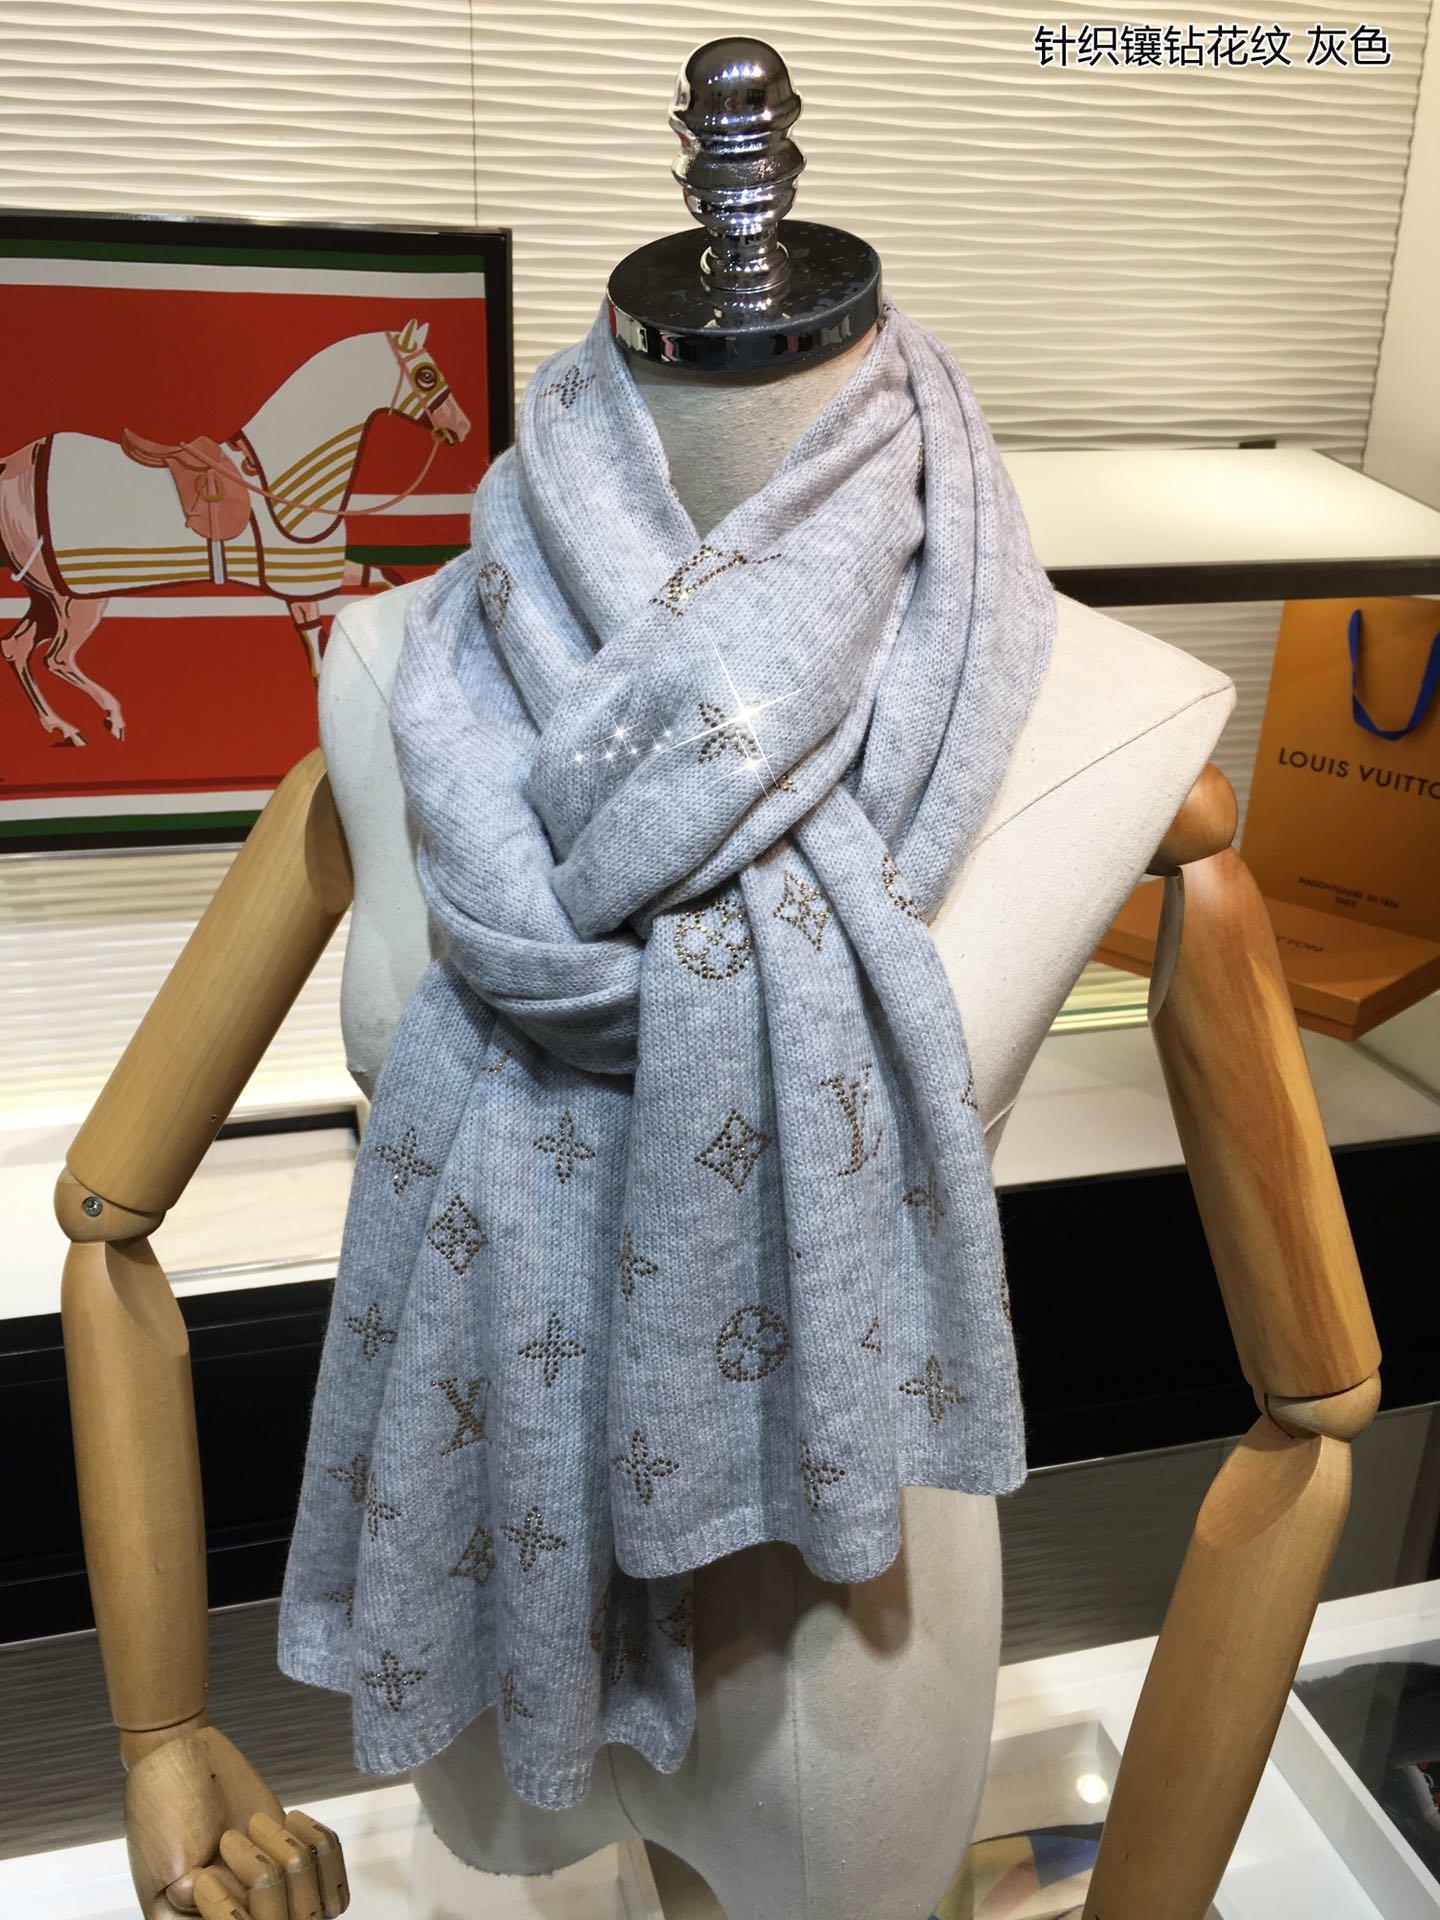 Replica Louis Vuitton Women Scarf 0021